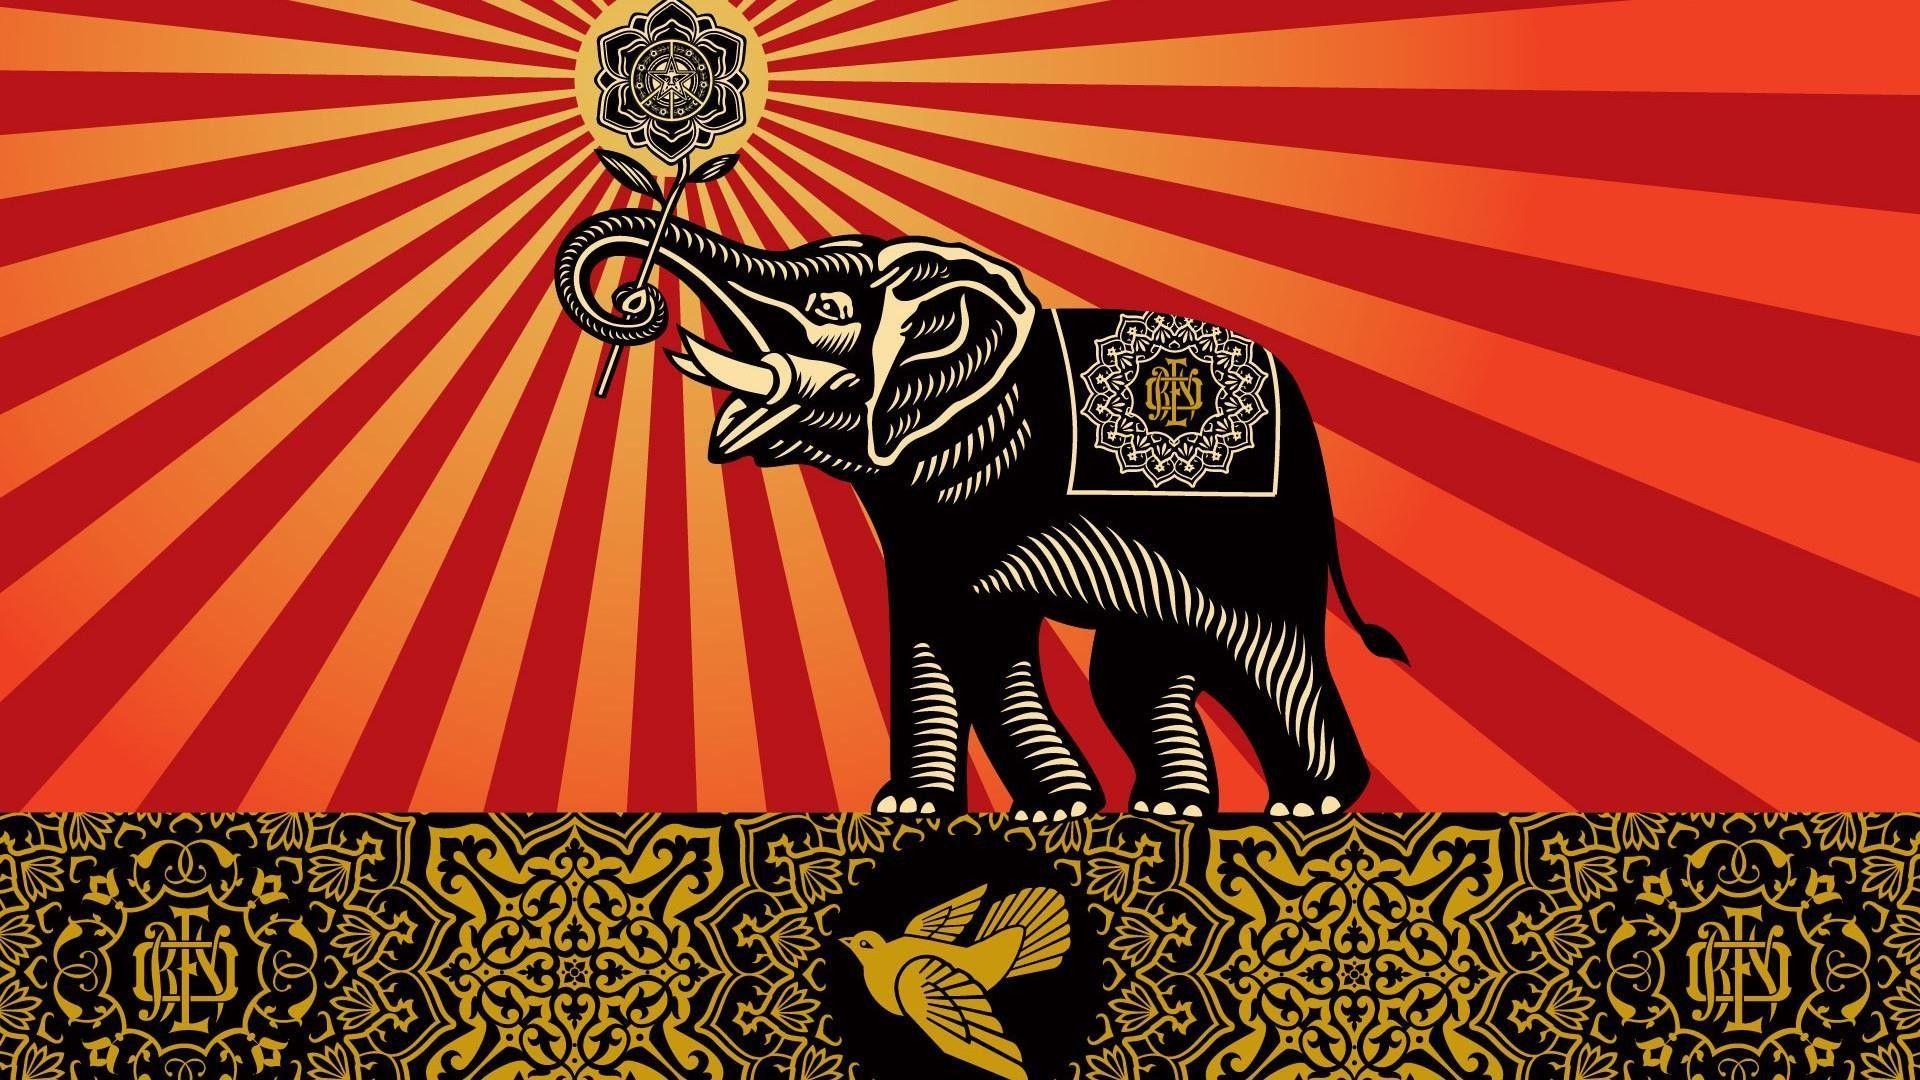 Elephant Art Wallpapers Top Free Elephant Art Backgrounds